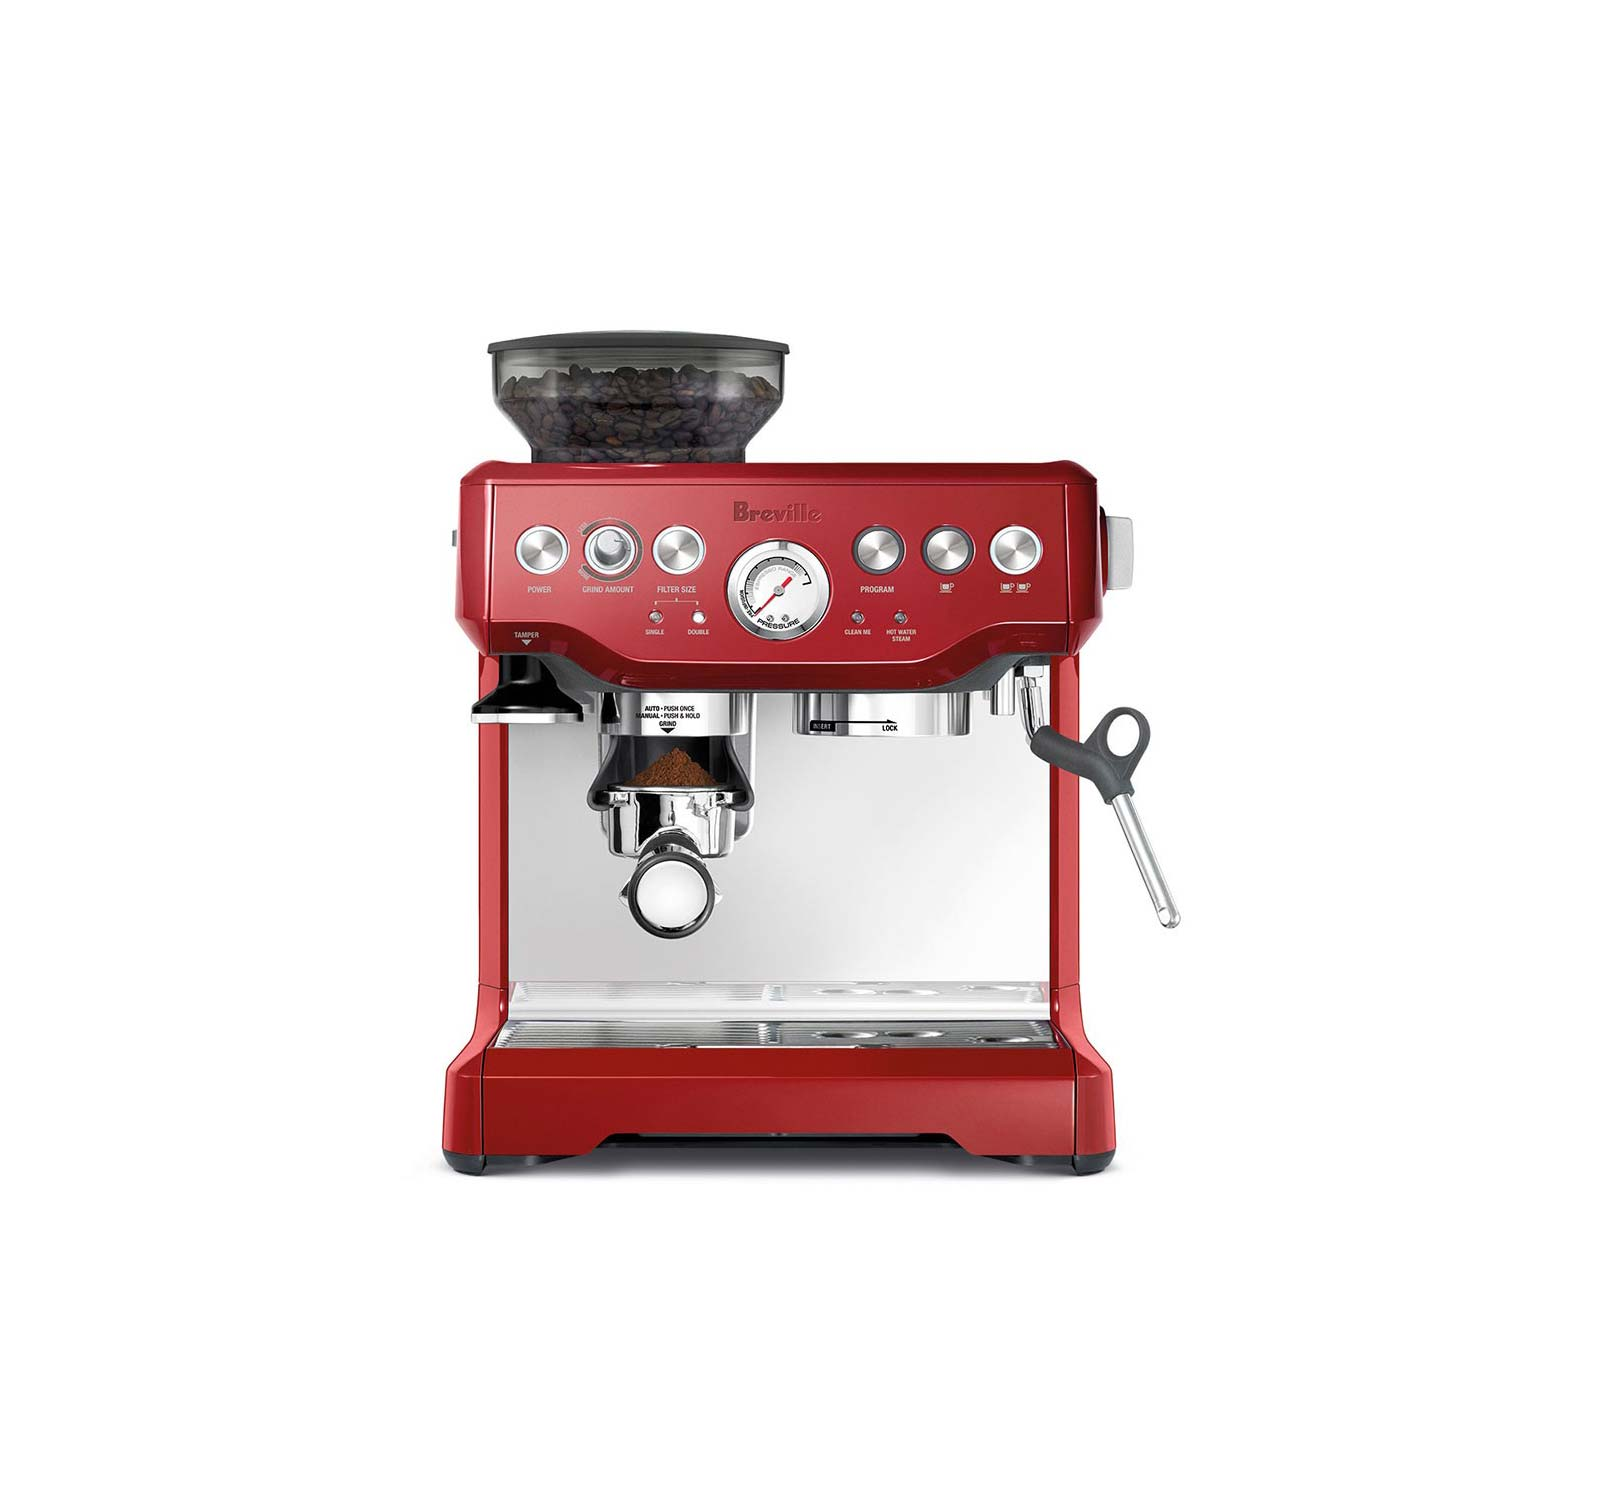 Breville Bes870cbxl Cranberry Barista Express Espresso